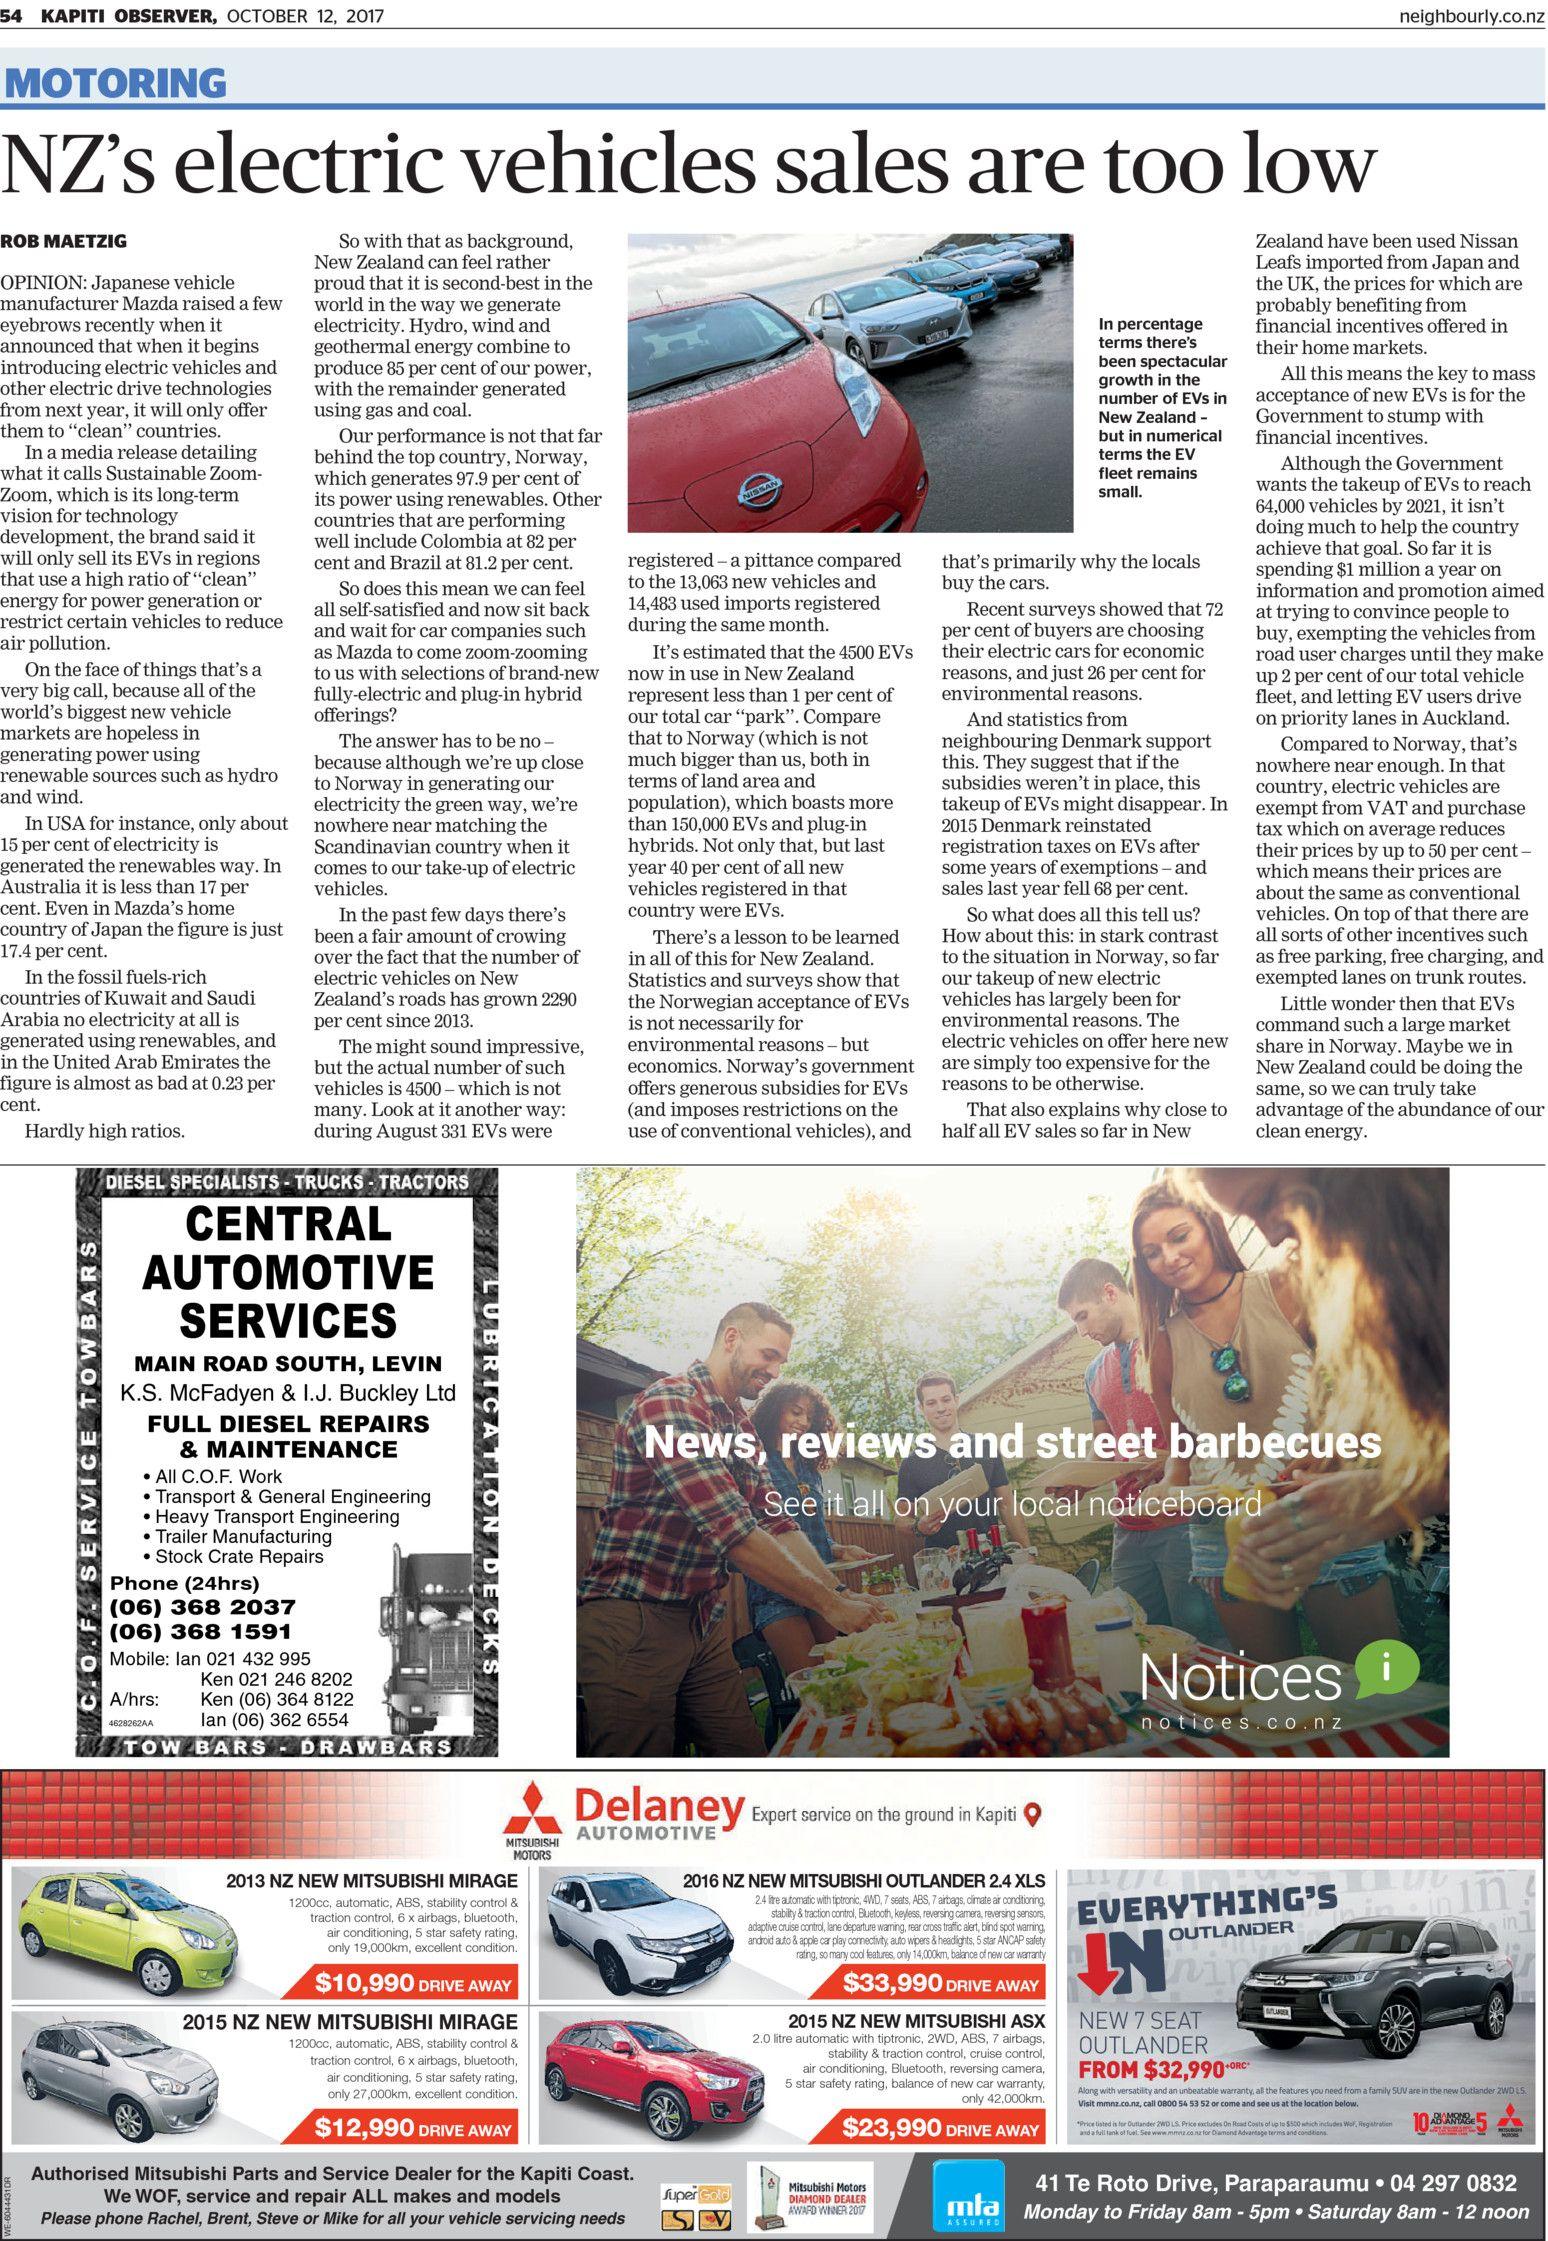 Kpiti Observer Read Online On Neighbourly Automatic Headlight Reminder